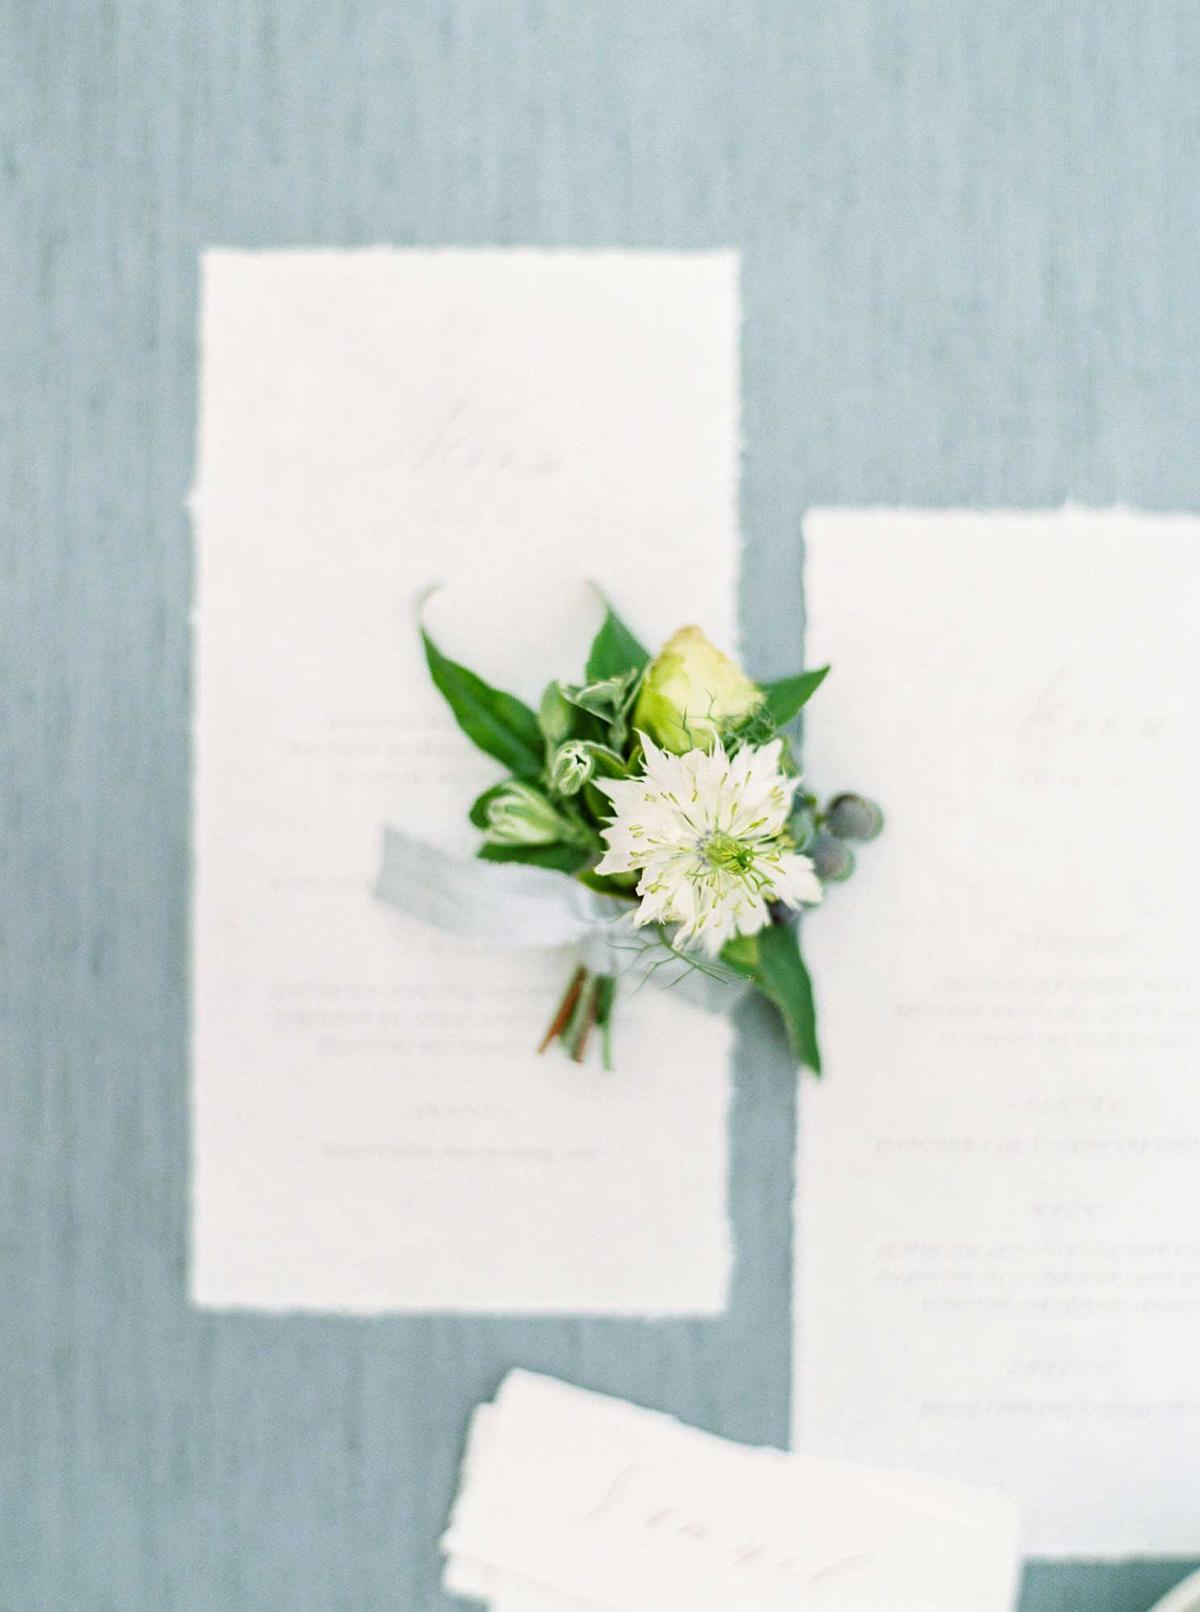 kayla-yestal-vineyard-bride-swish-list-woodland-weddings-niagara-wedding-editorial-15.jpg